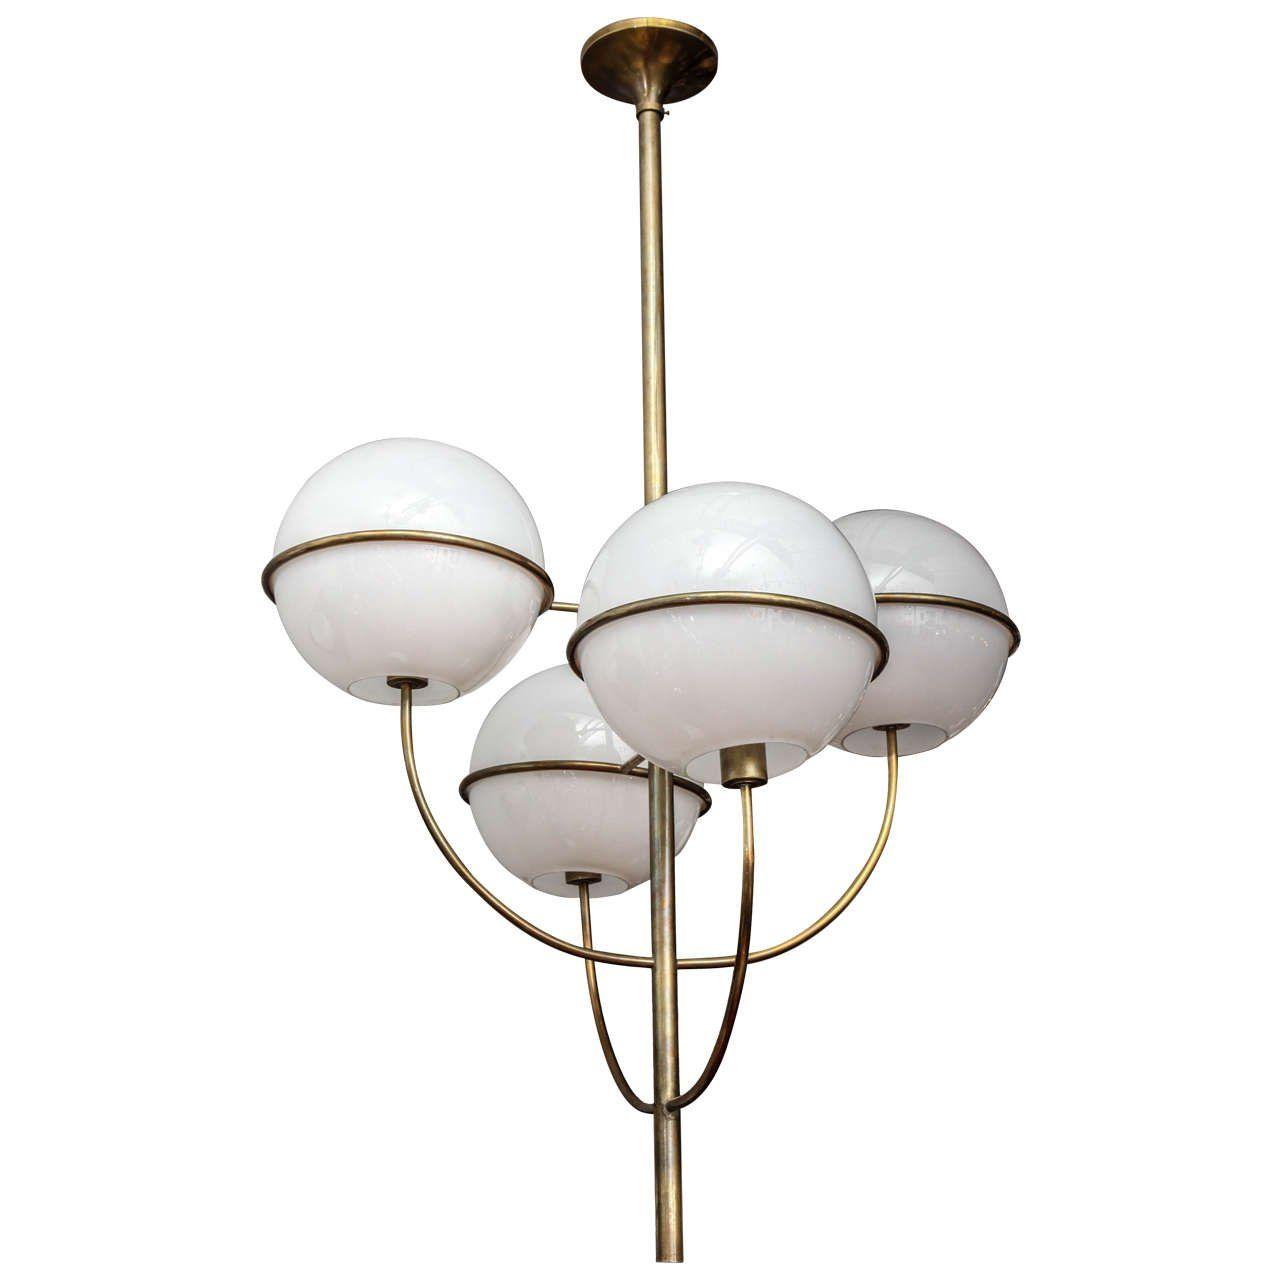 Grand Mid Century Modern Four Globe Chandelier By Gino Sarfatti 1